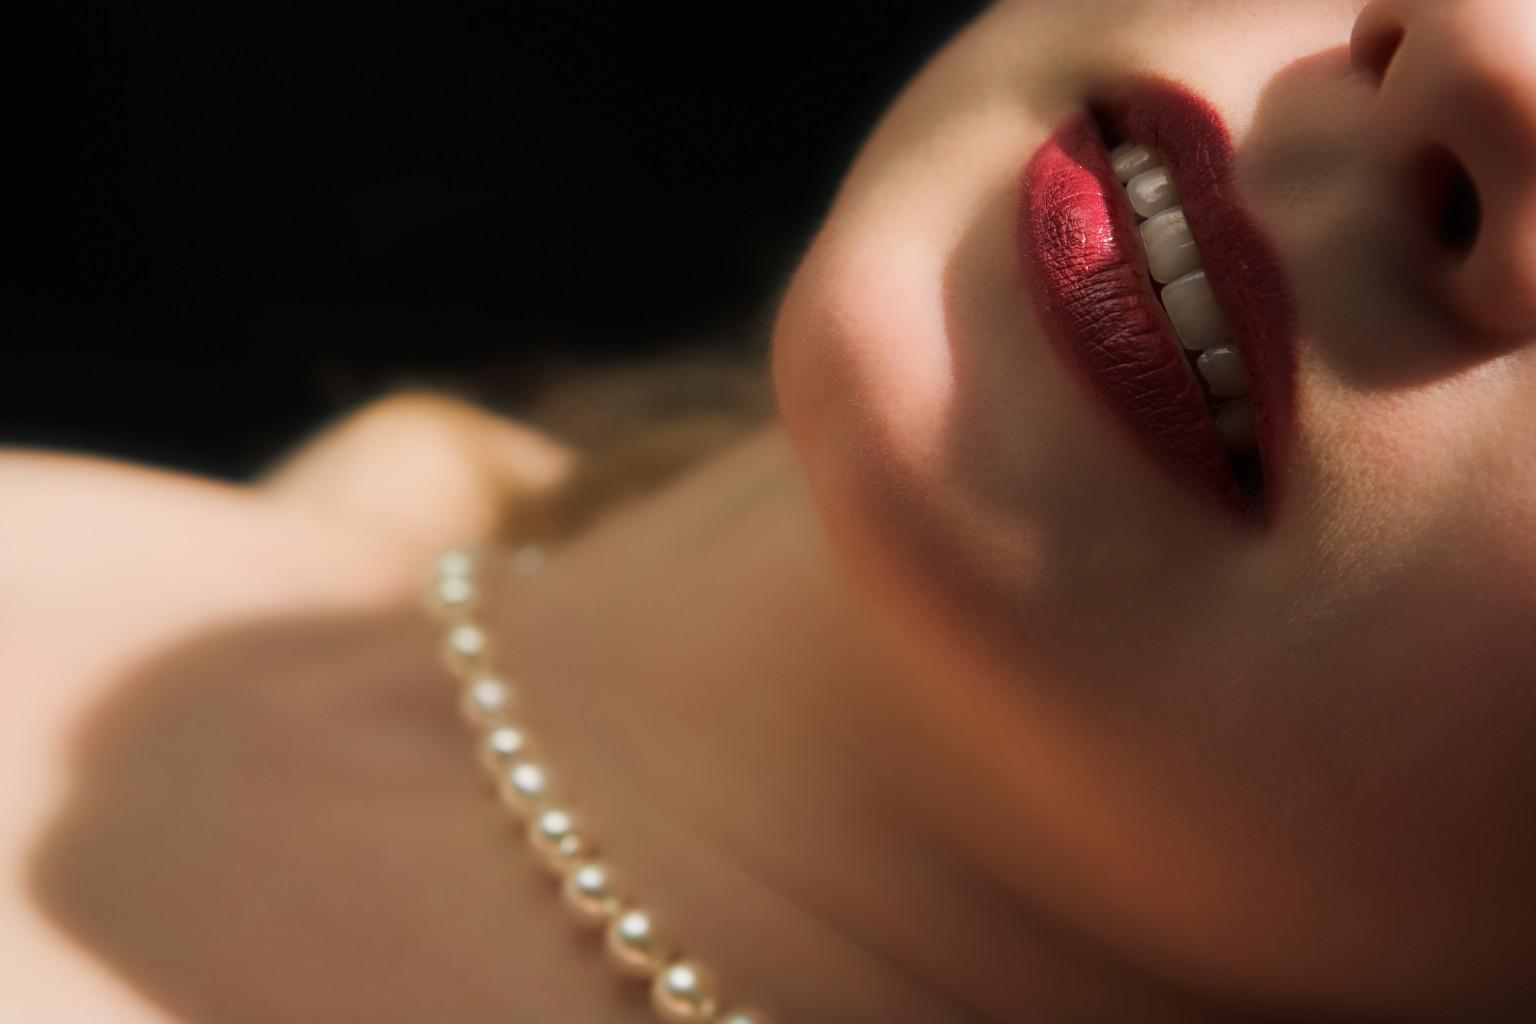 Freesound - Awesome female orgasm sound by valent